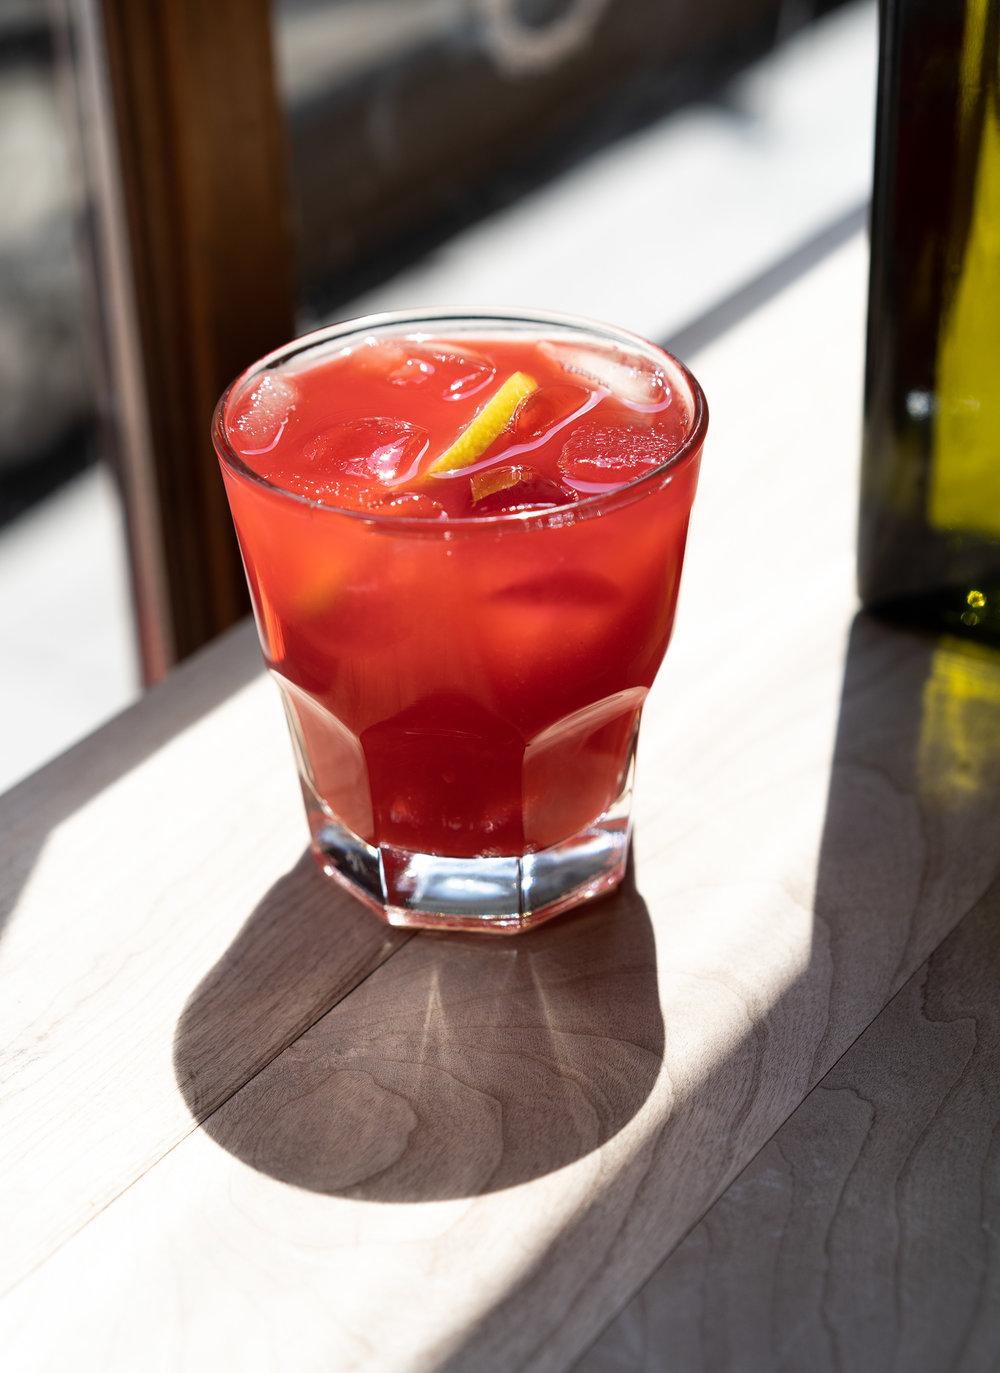 Thirst-quenching Raspberry Lemonade.